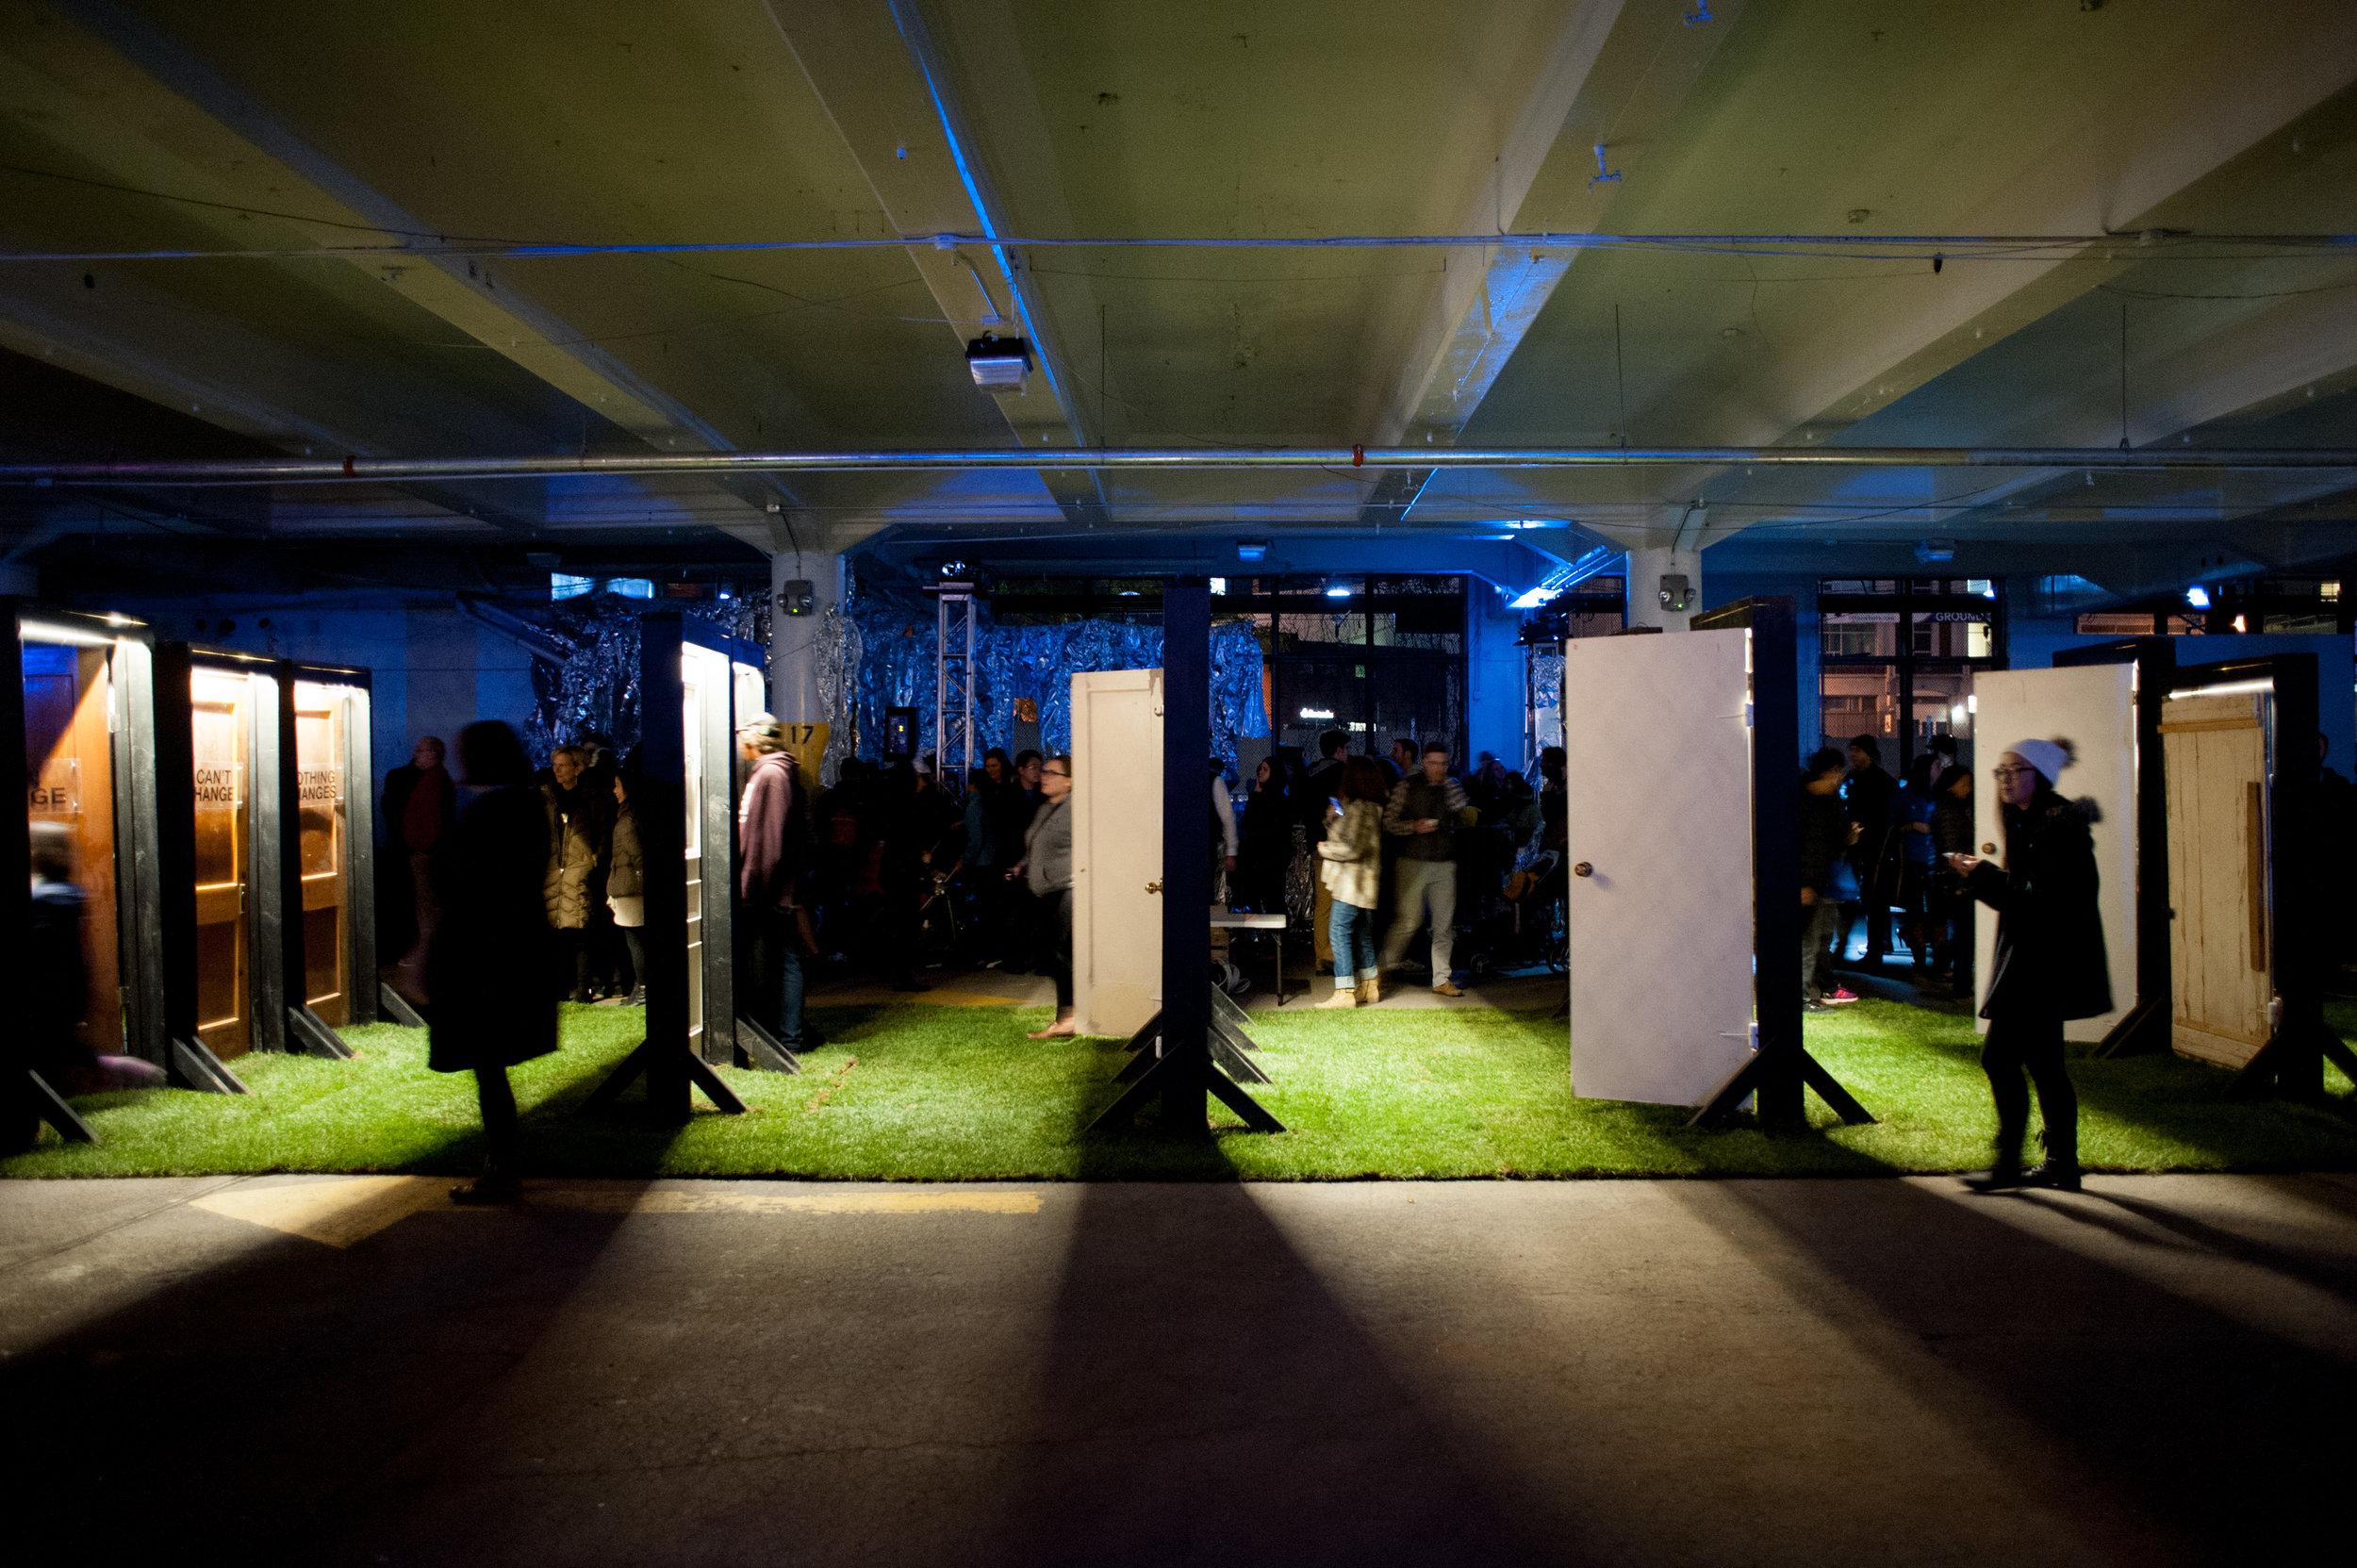 Between Doors_Labspace Studio (John Loerchner & Laura Mendes)_Illuminus 2015_Photo by Tina Tian_1.jpg